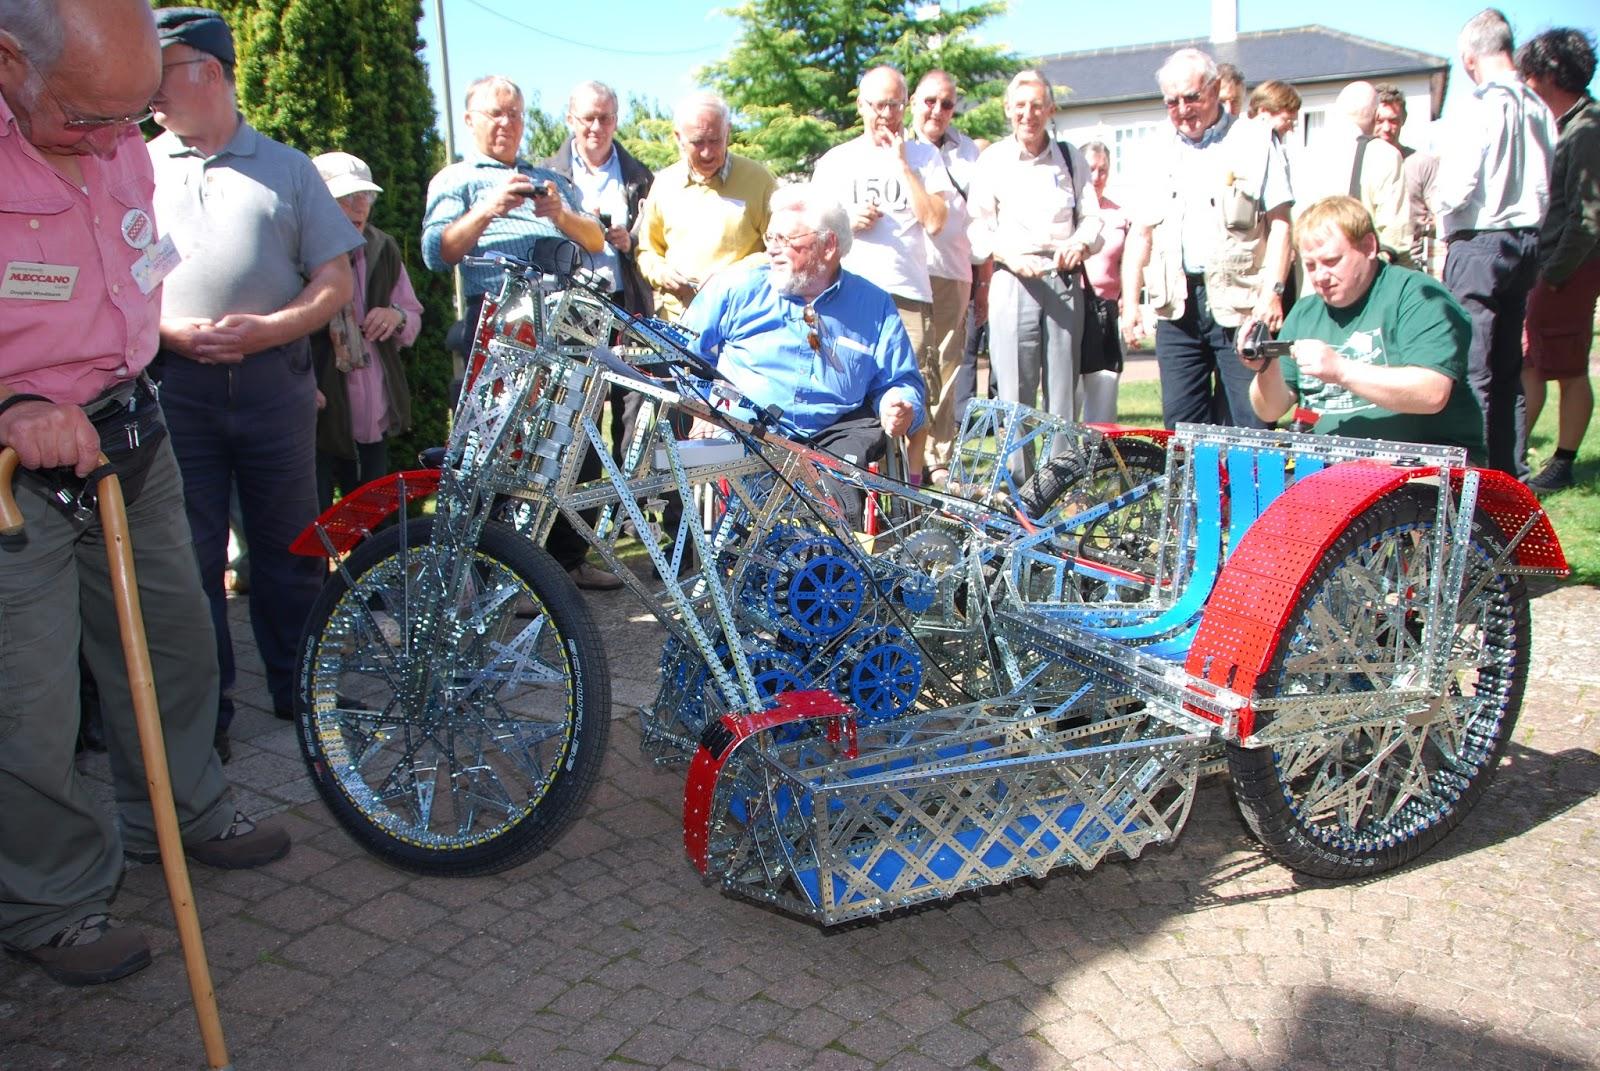 james-may-motorbike-ralph-laughton.jpg